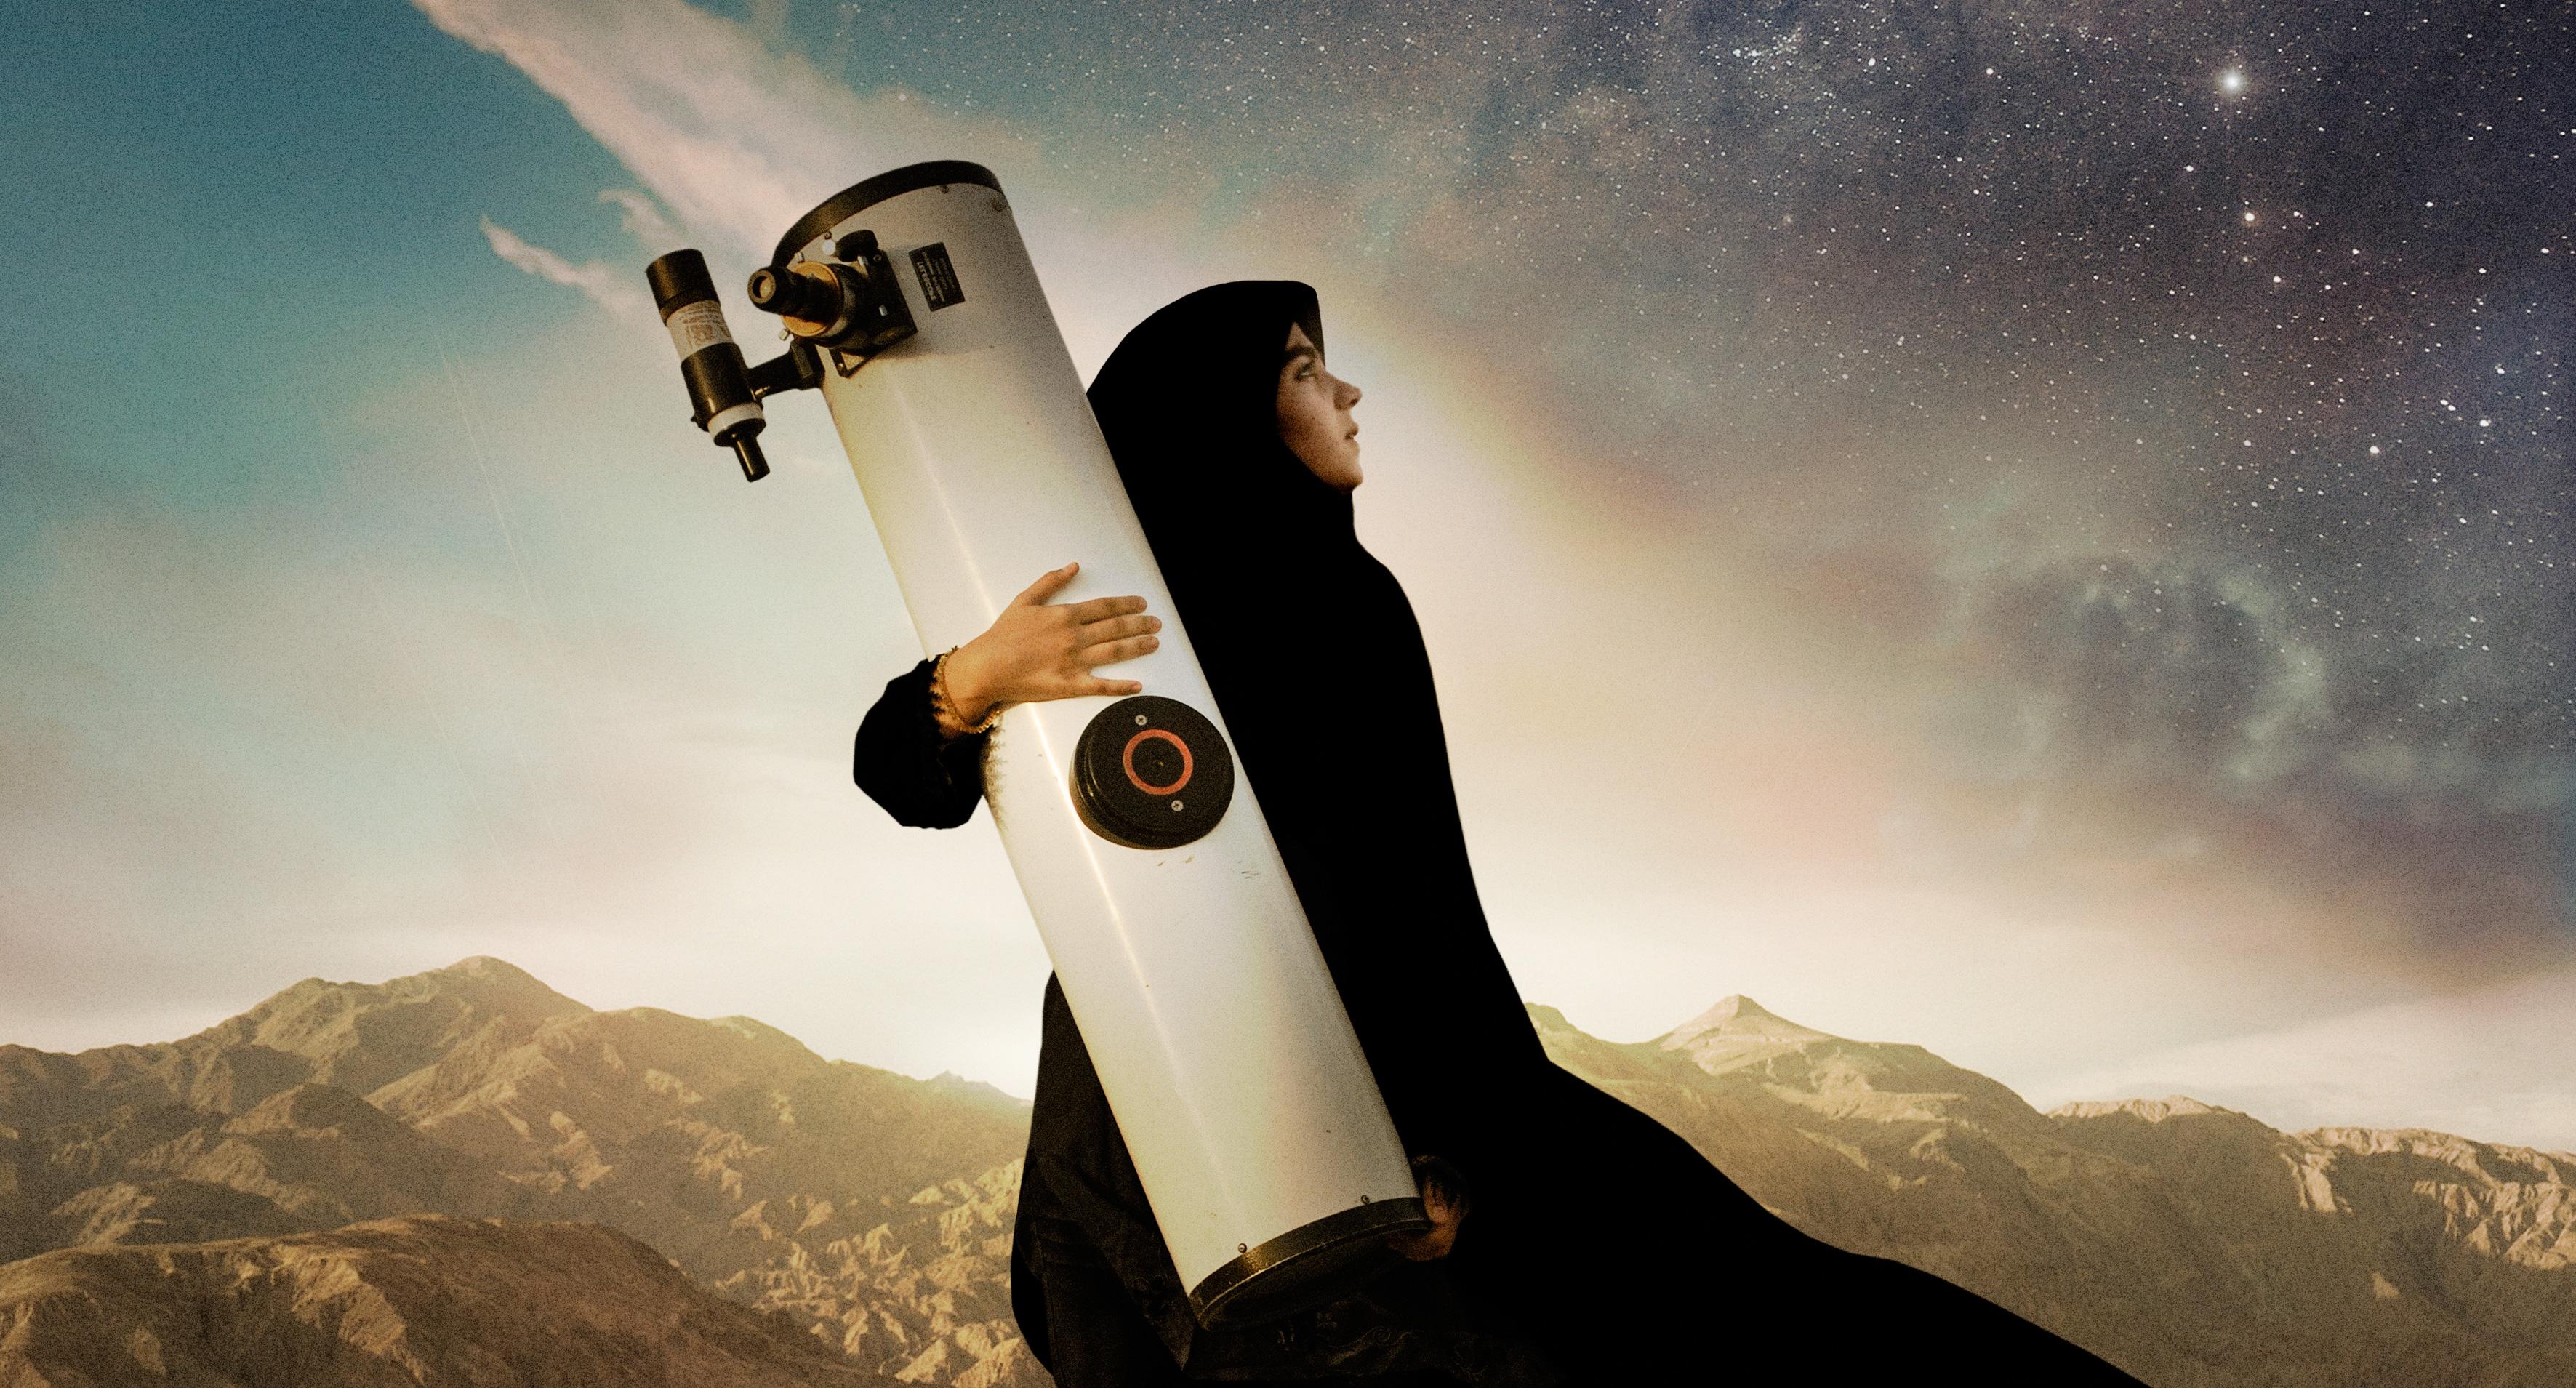 SEPIDEH_-Filmens-billlede_-lavkant_-Sepideh-med-teleskop_-Credit-Paul-Wilson